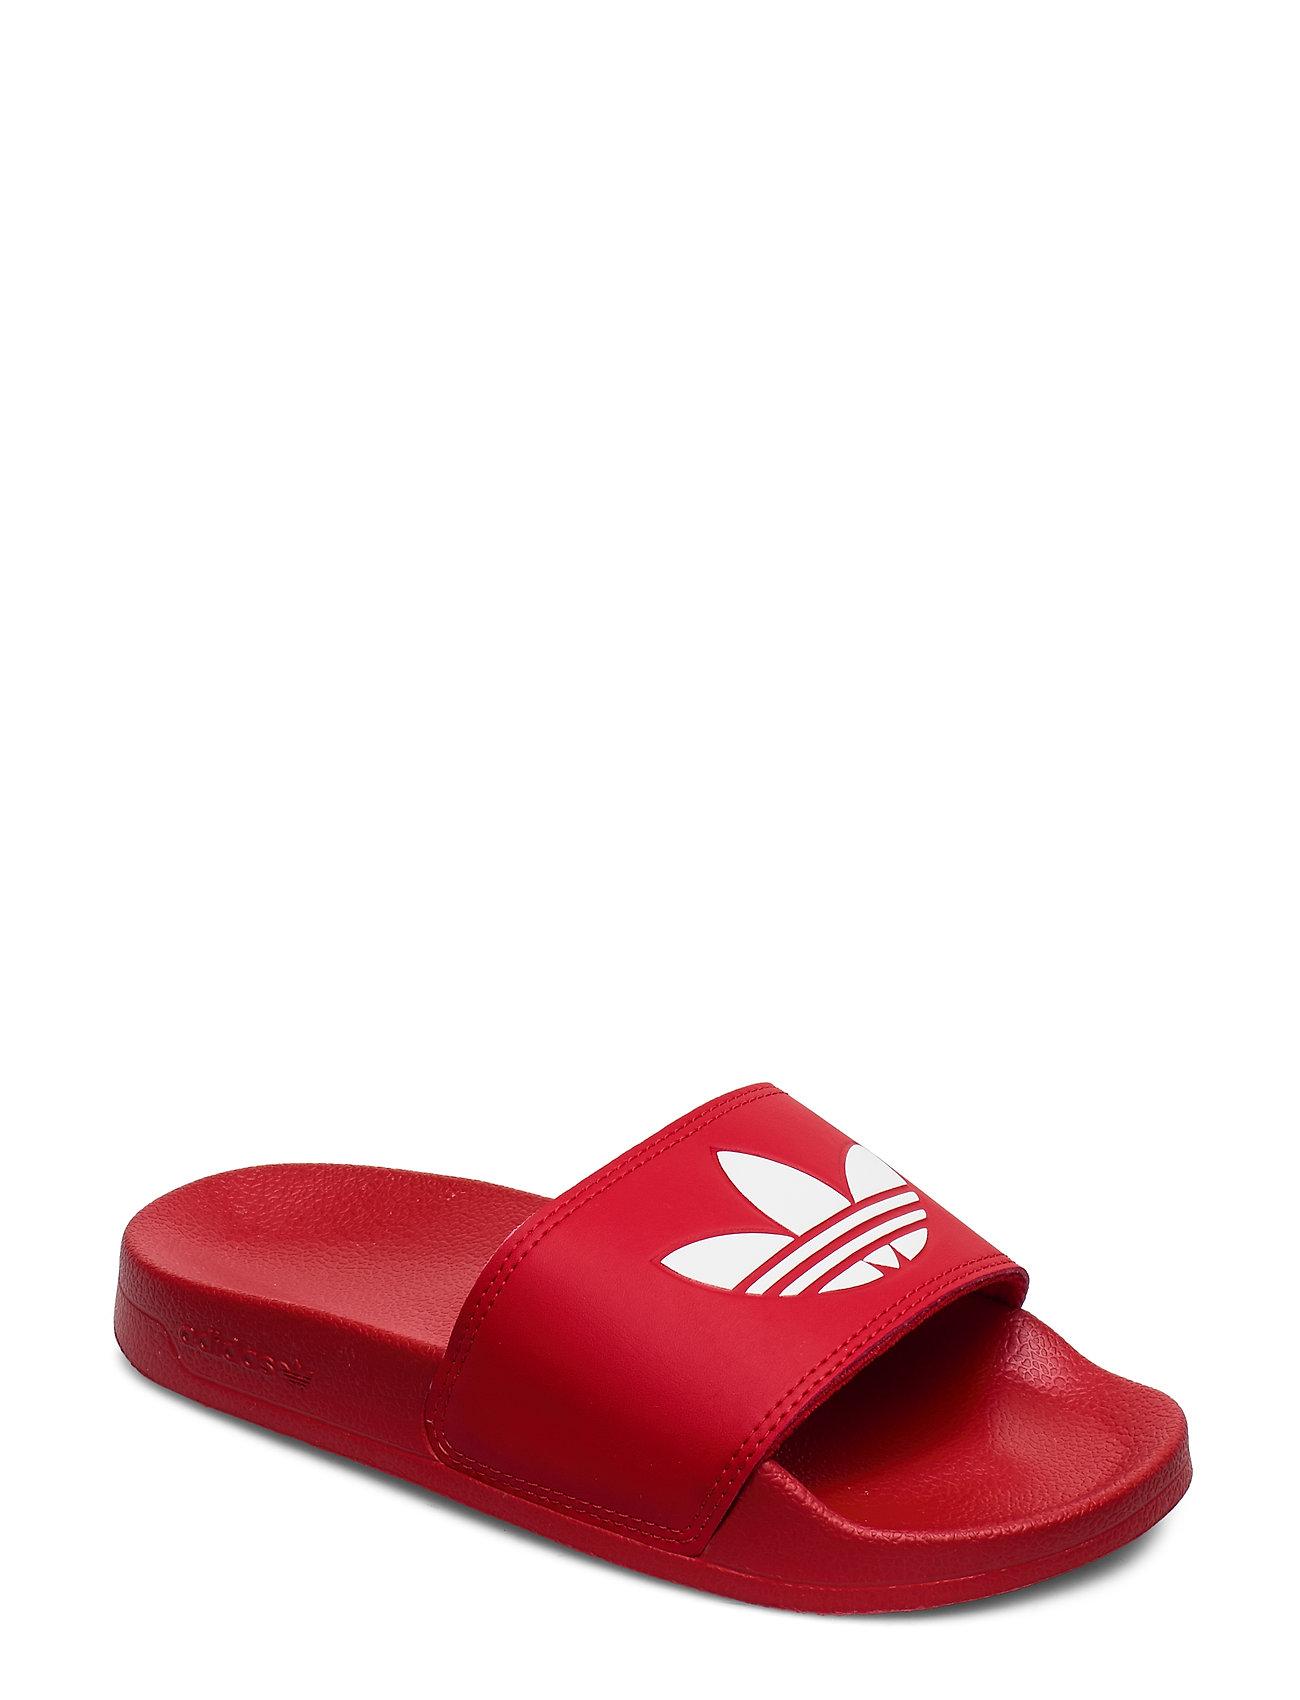 adidas Originals ADILETTE LITE J - SCARLE/FTWWHT/SCARLE